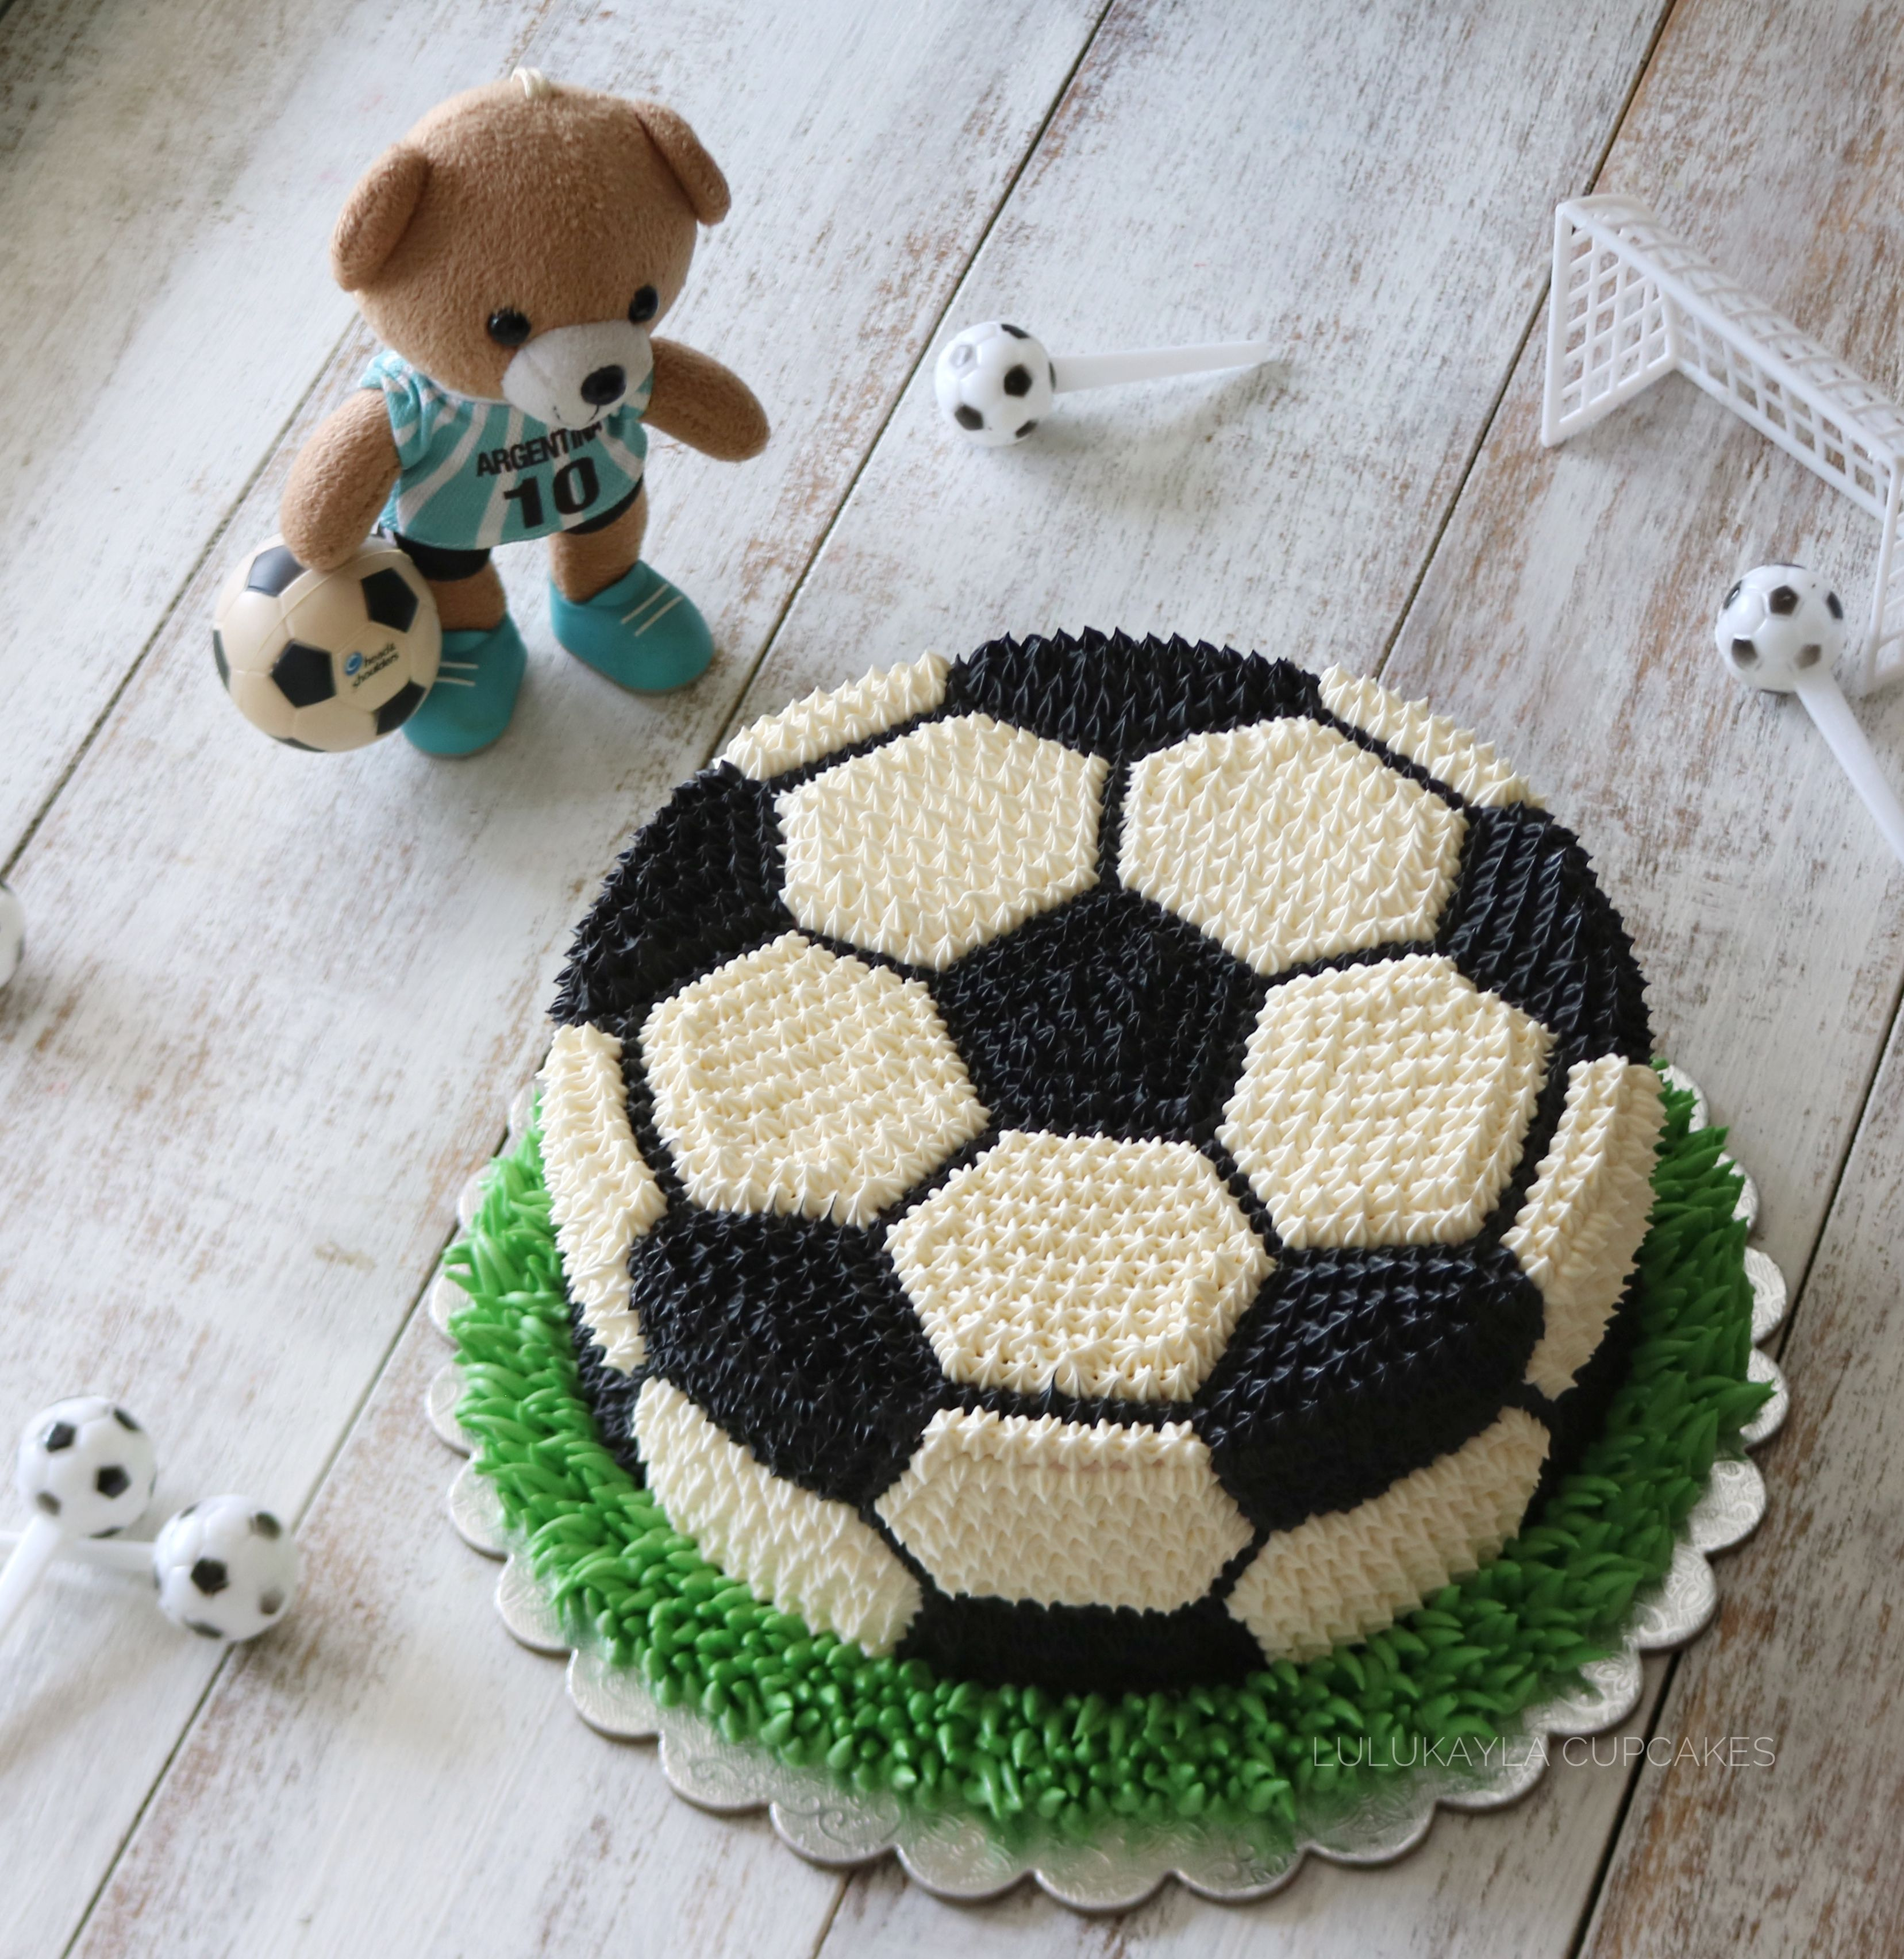 Soccer Buttercream Cake Buttercream Cake Soccer Cake Soccer Birthday Cakes